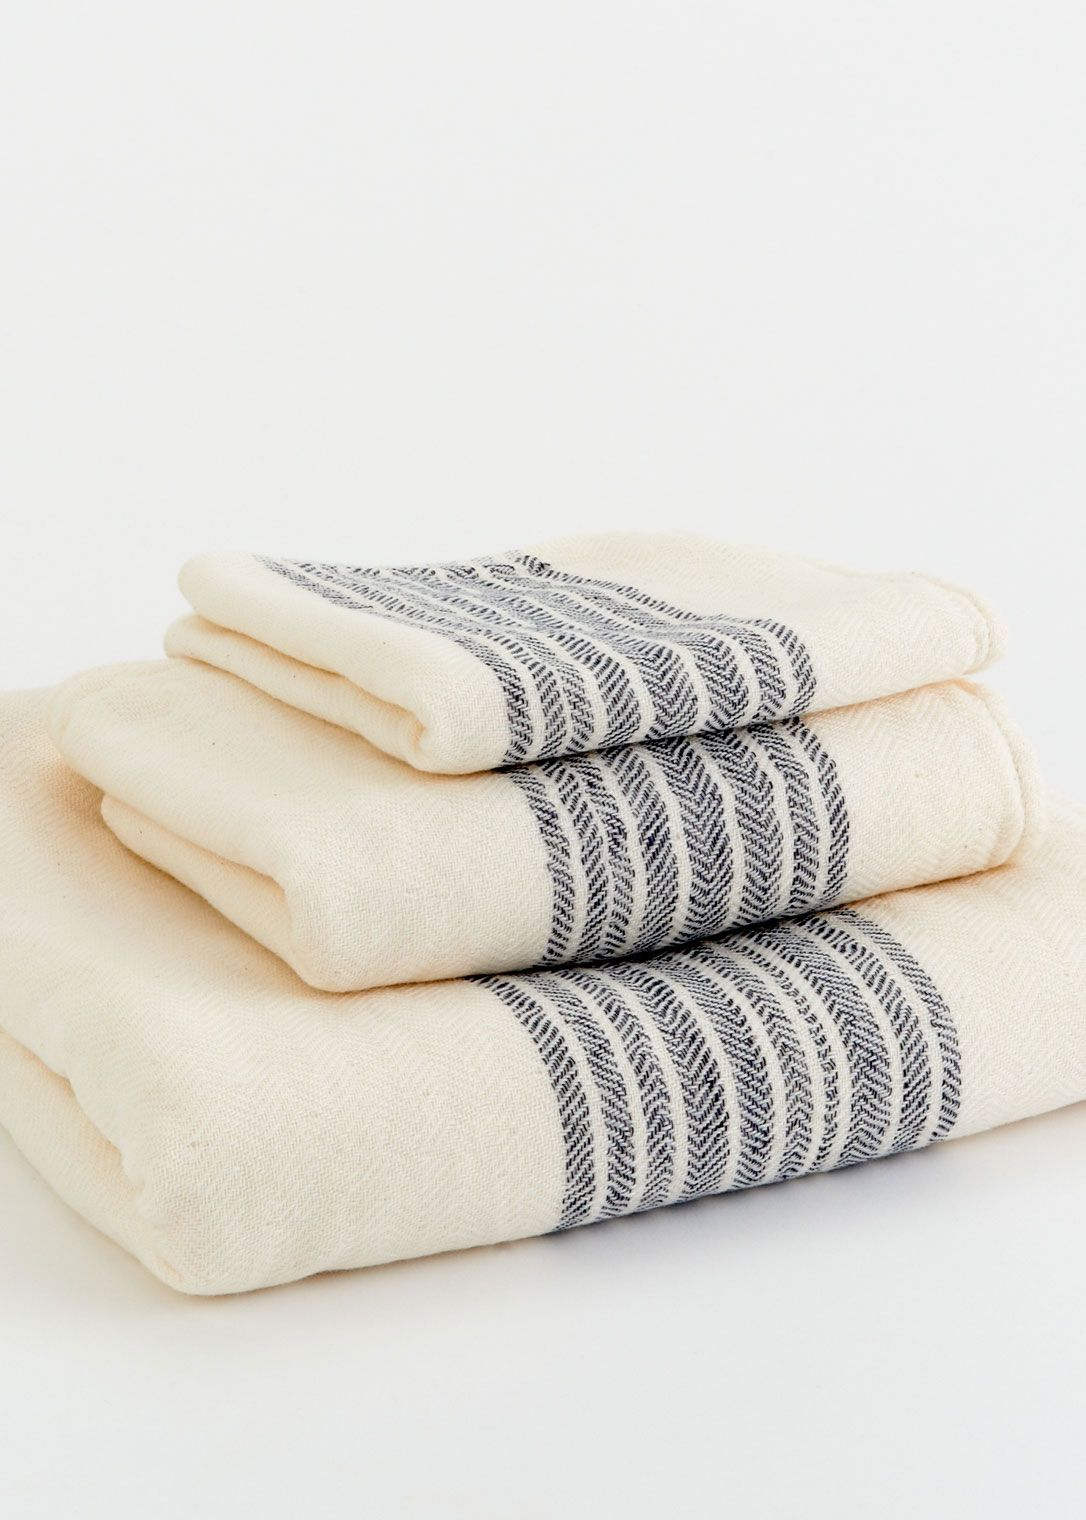 Chevron Stripe Bath Towel Collection Navy Rodales 타월 인테리어